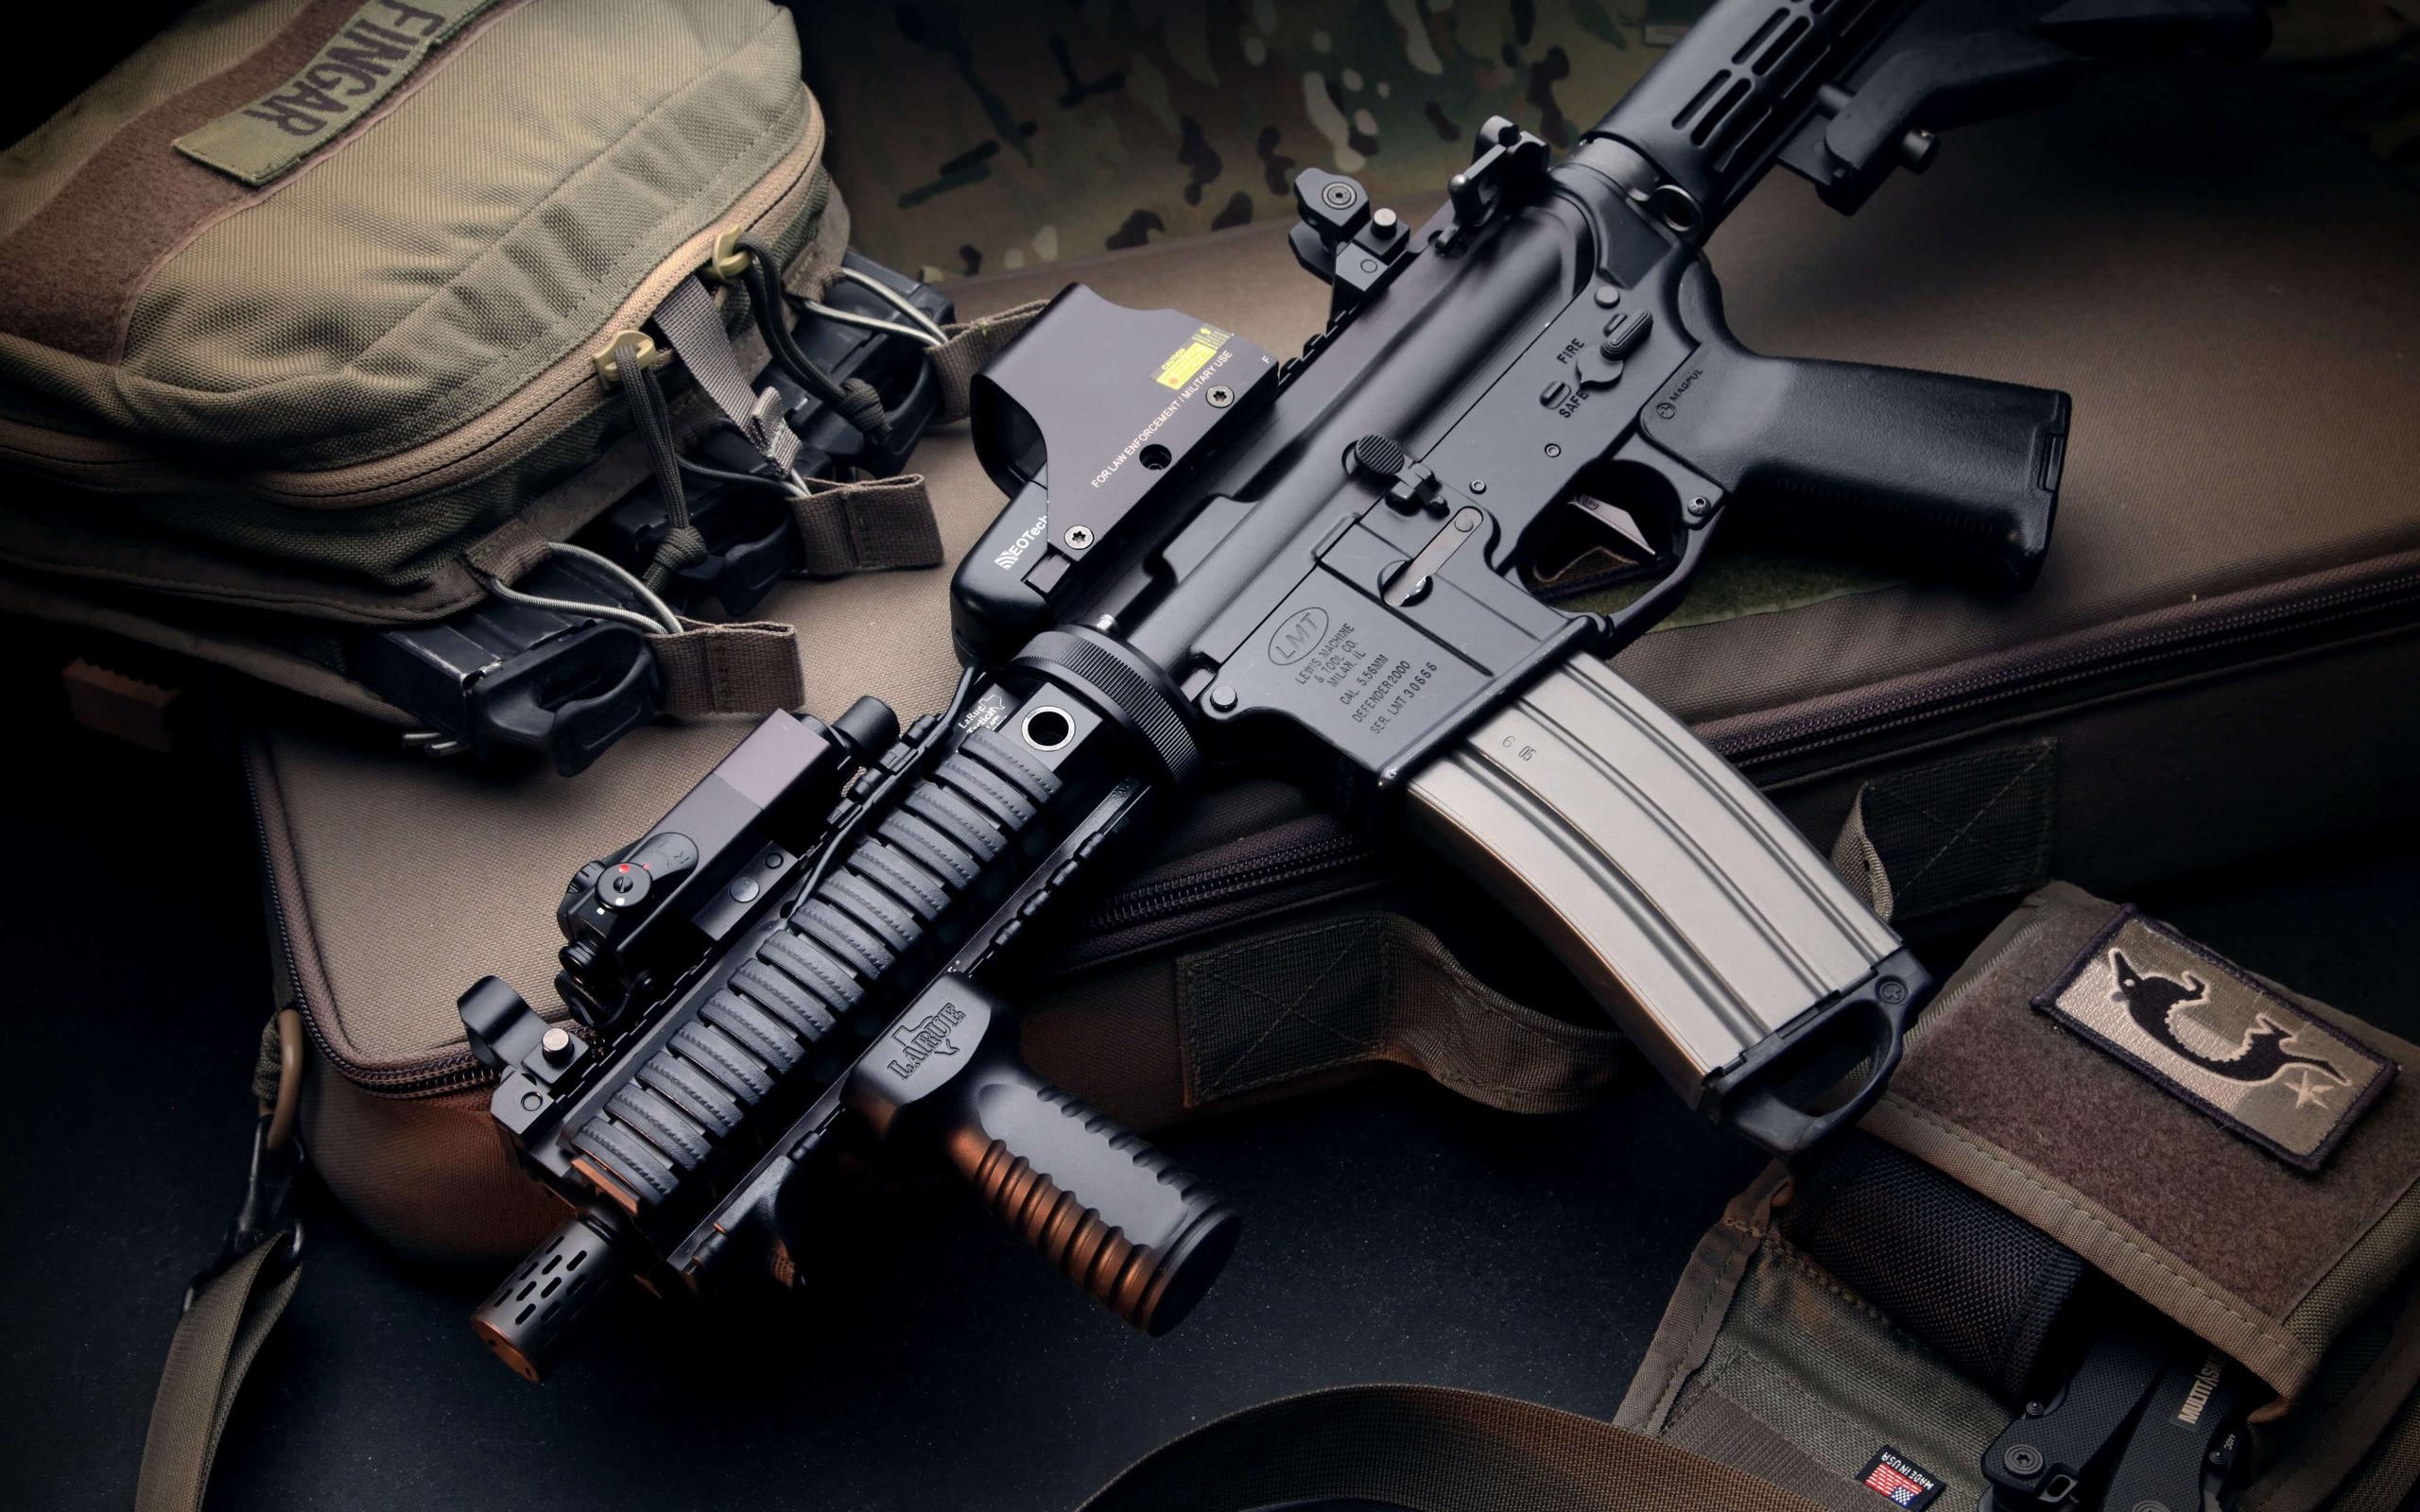 Weapon Bag Magpul Collimator M4 Machine Gun Military